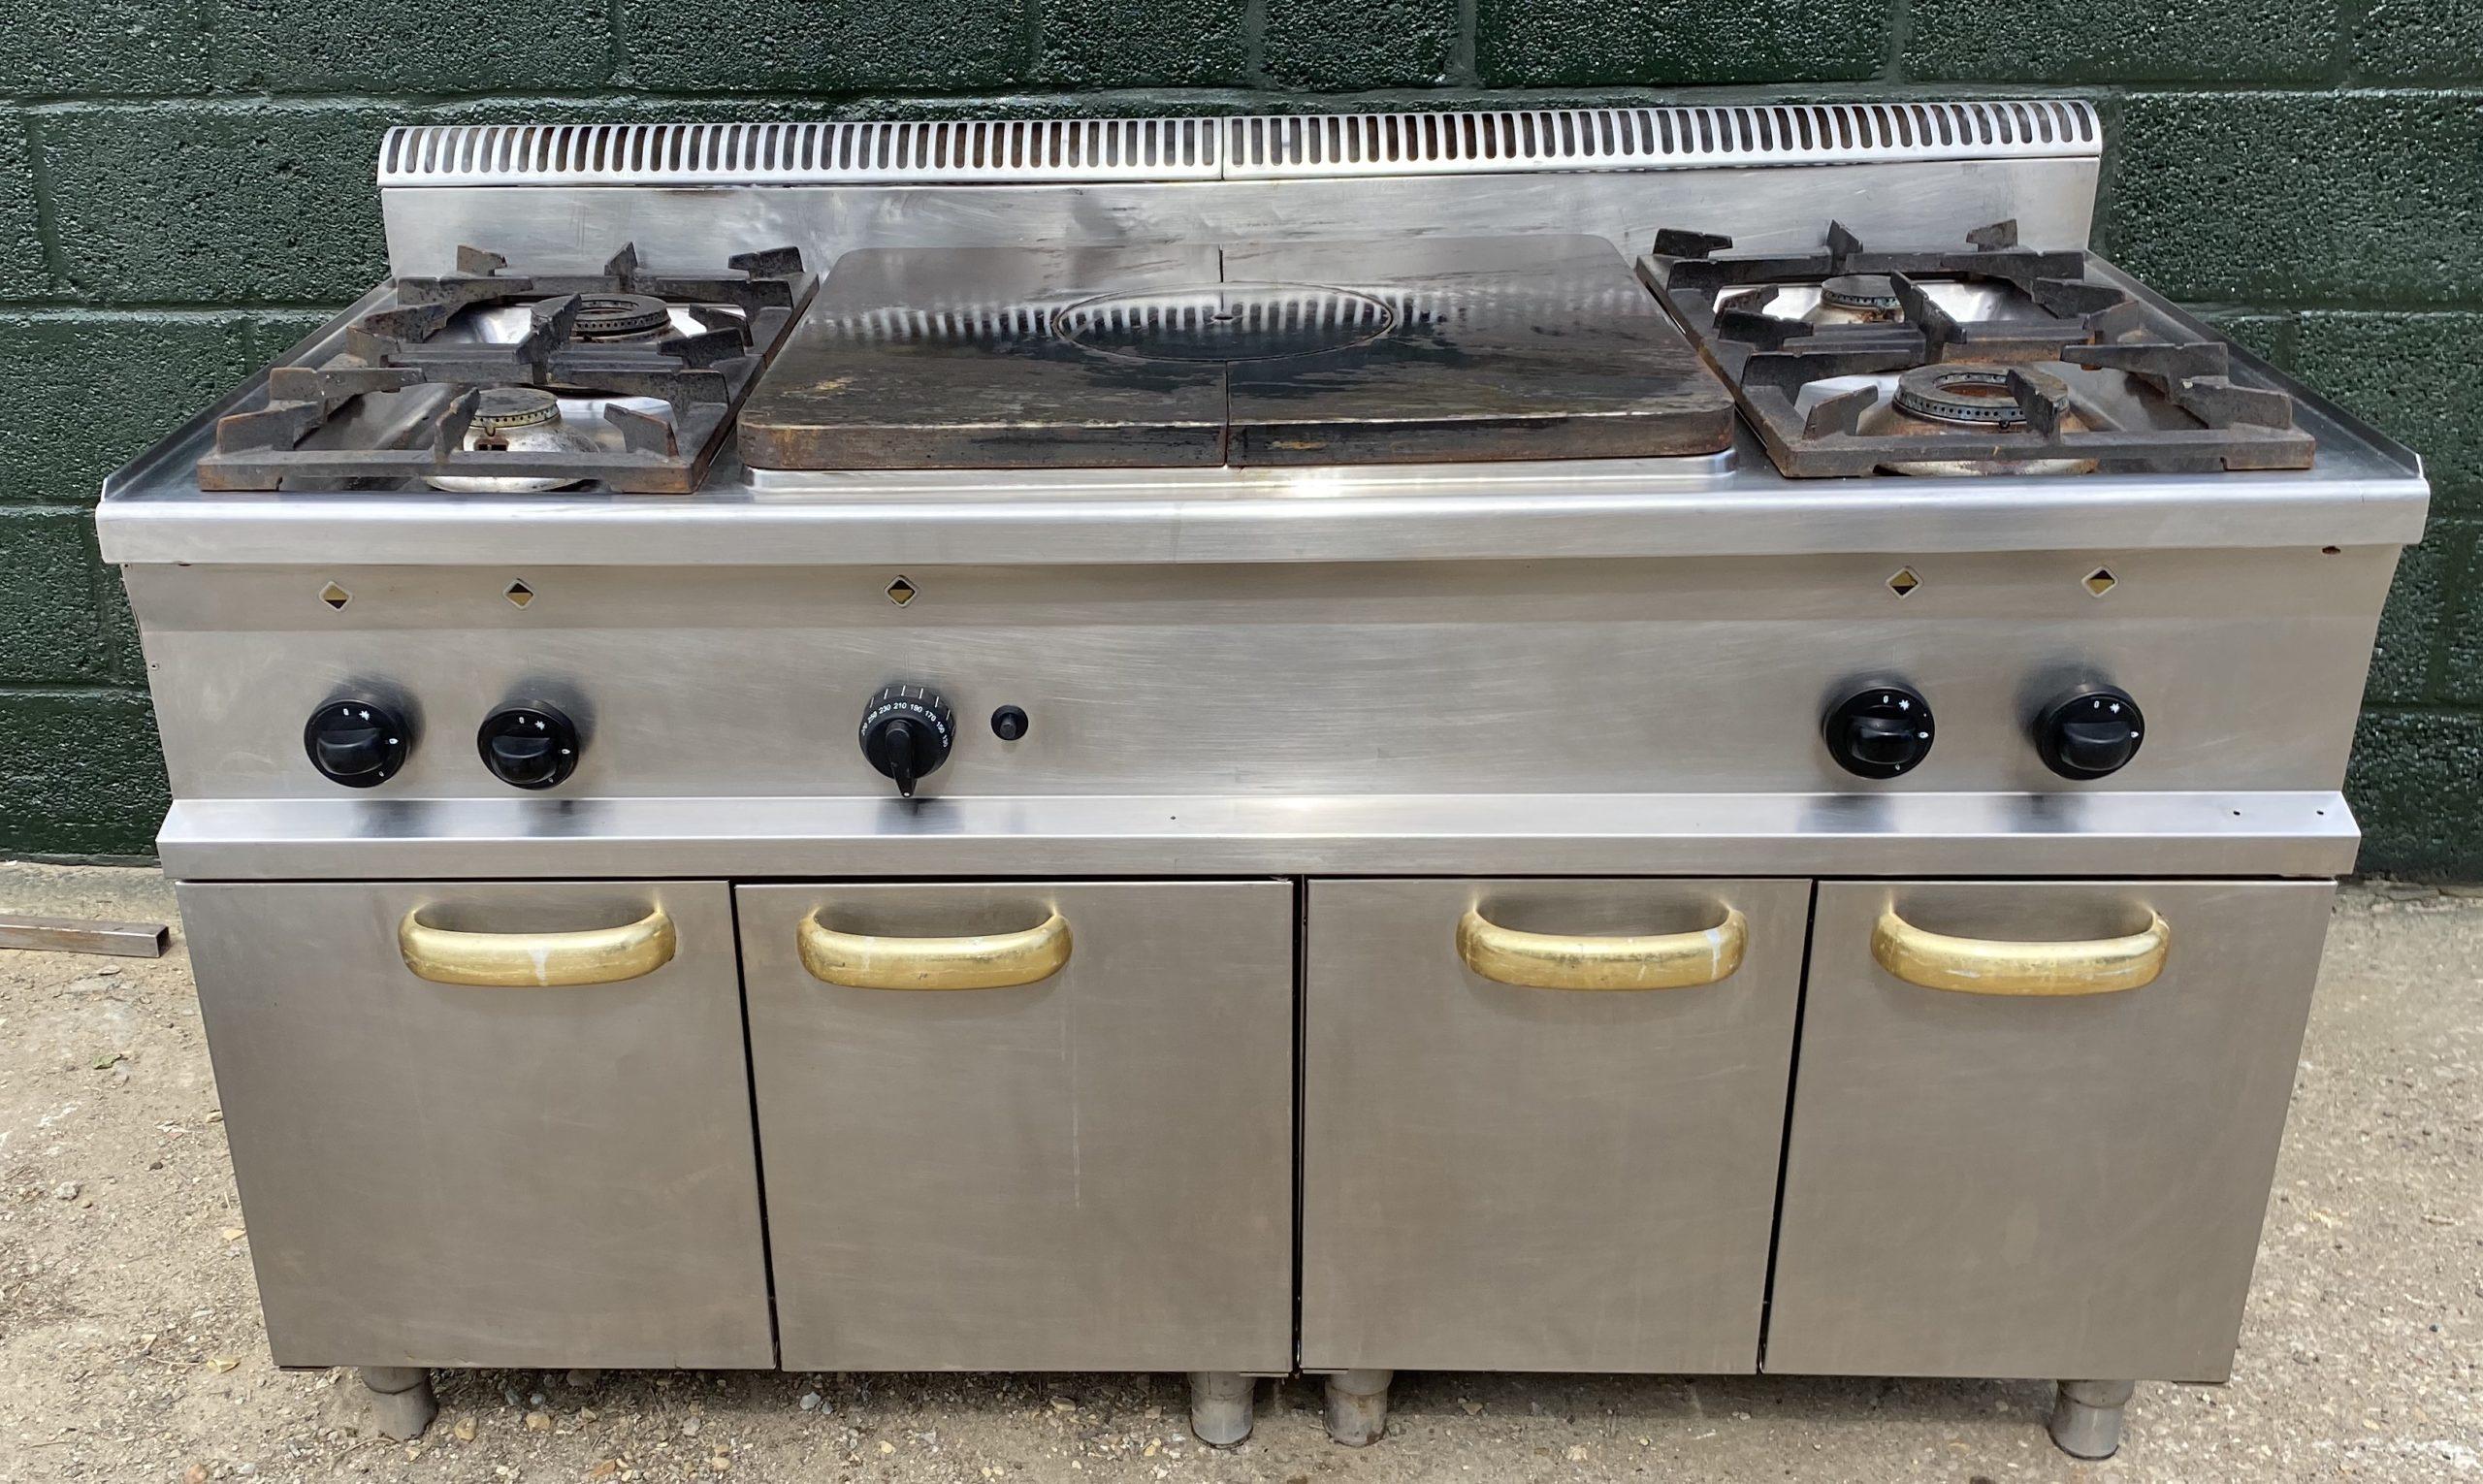 Hobart Solid Top & 4 Burner with Ambient Storage